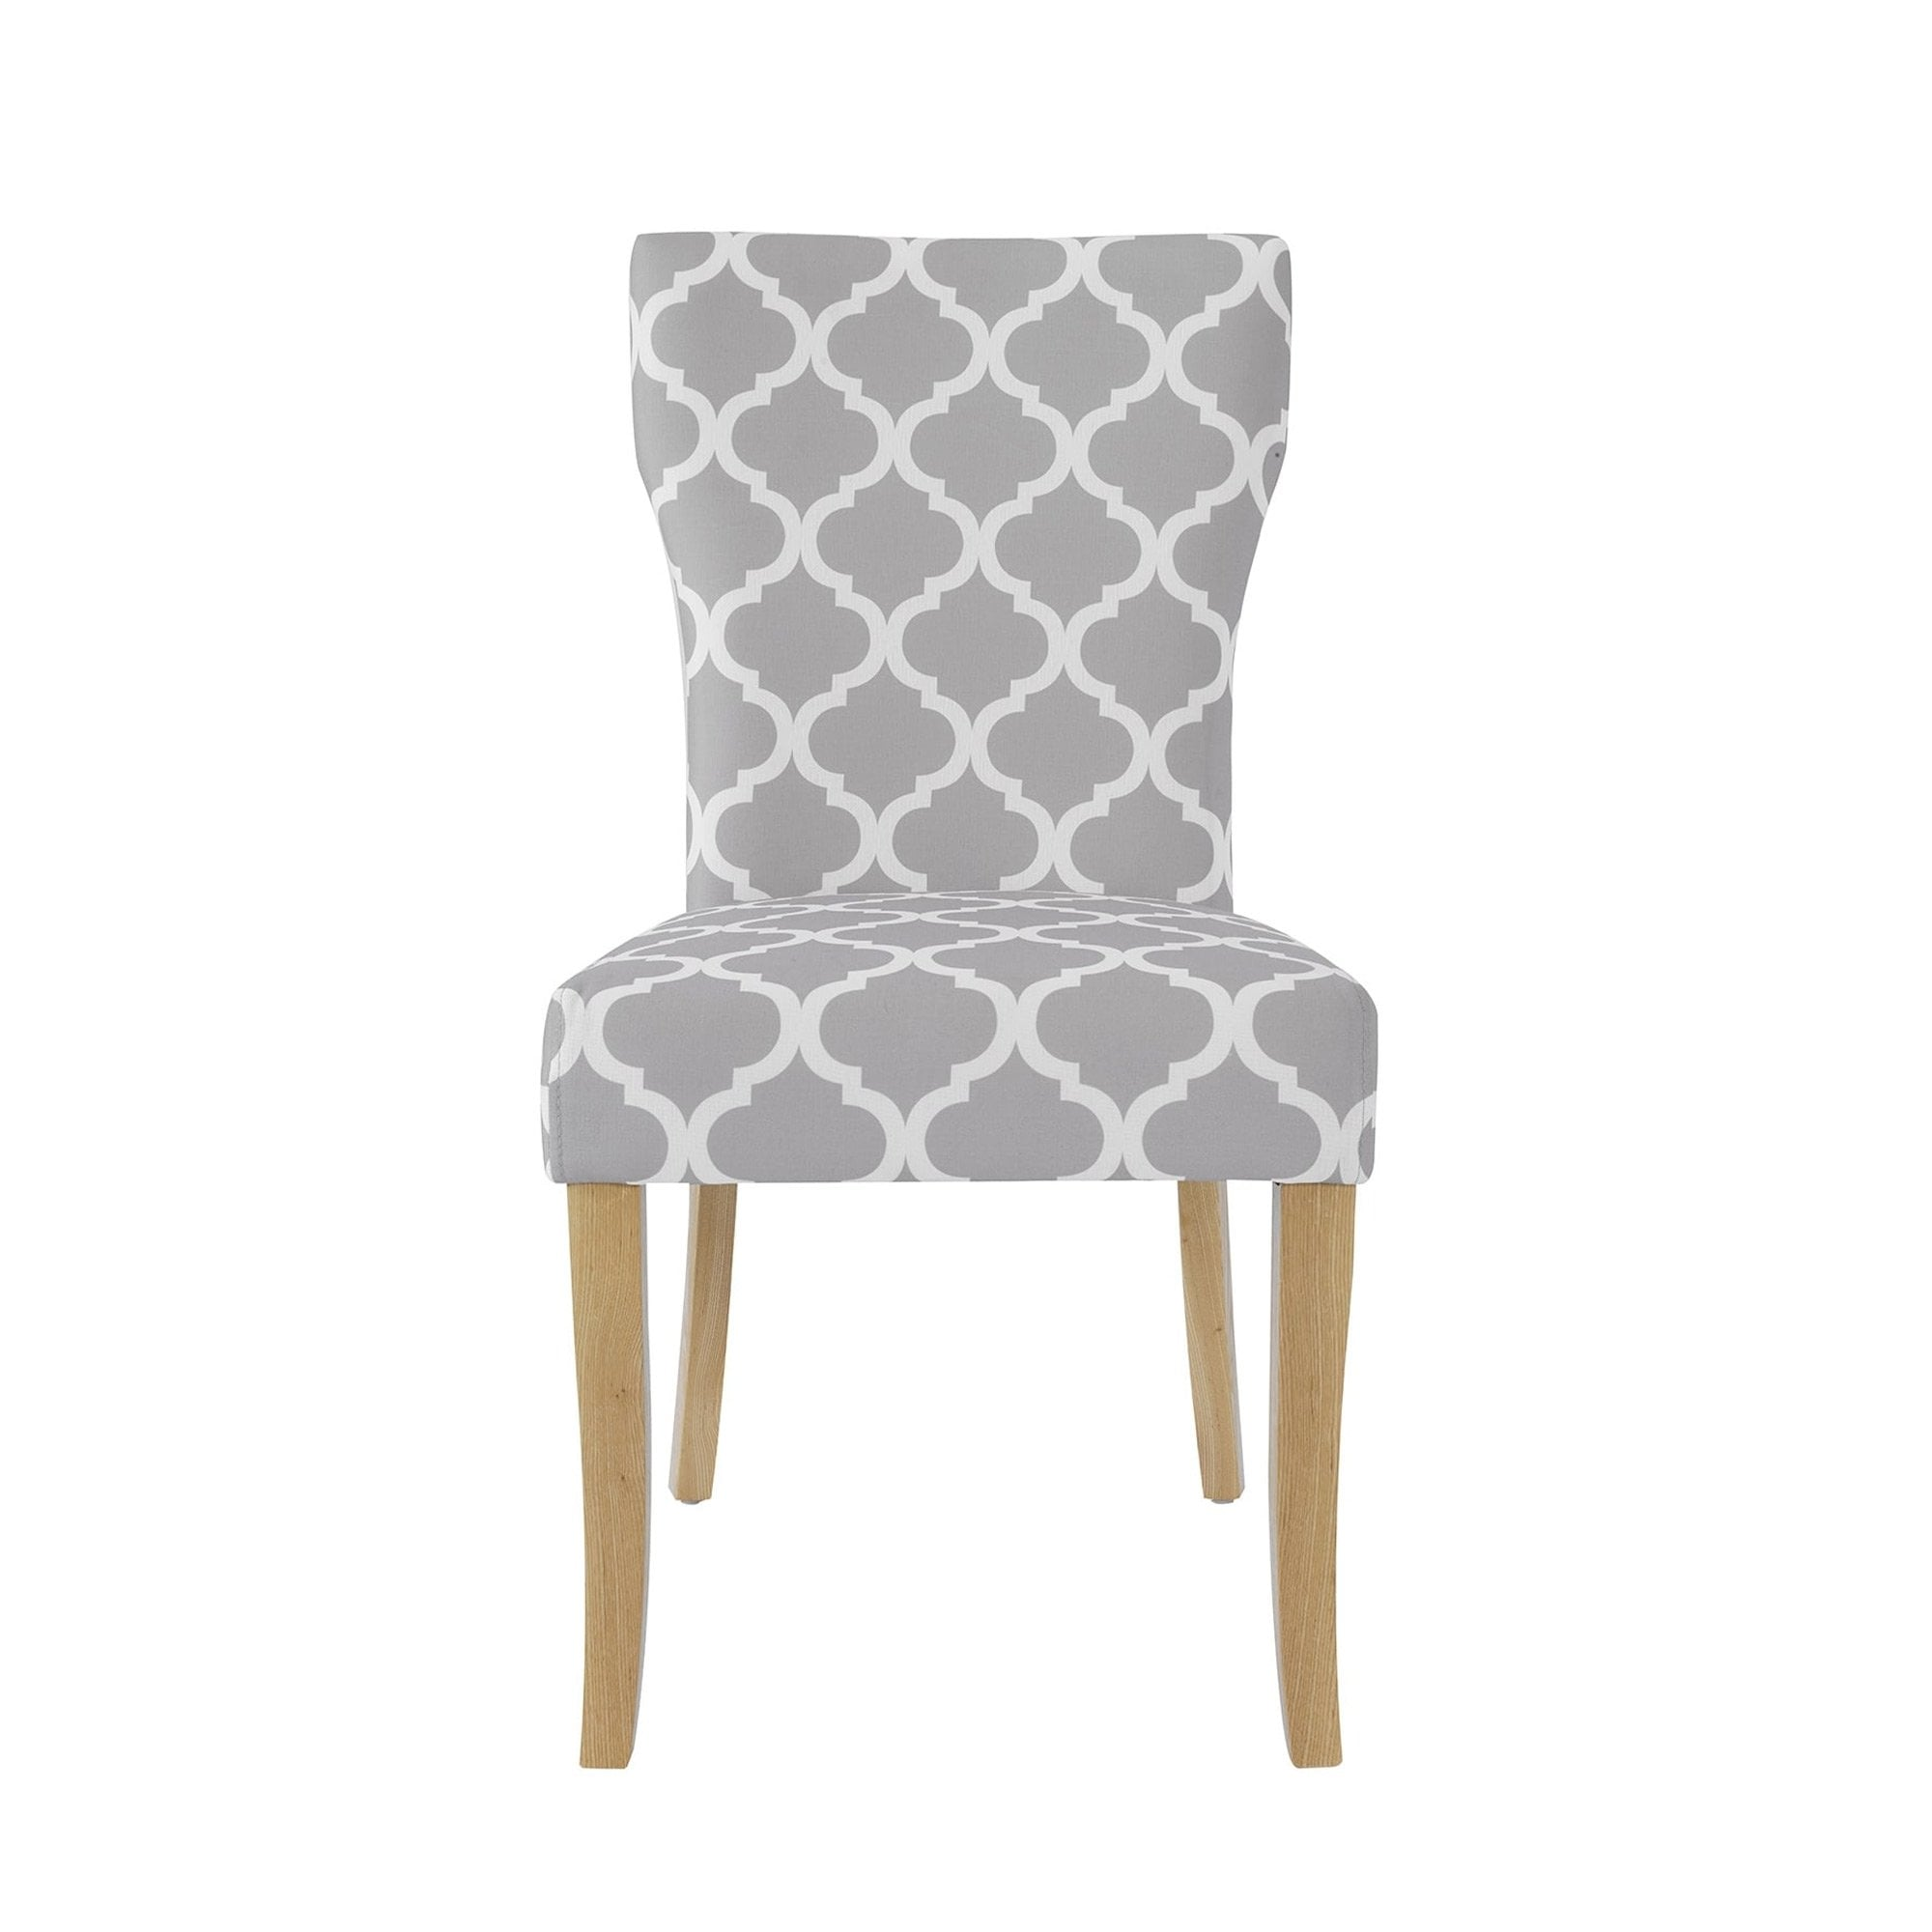 LPD Furniture Hugo Grey Fabric Dining Chair Pair